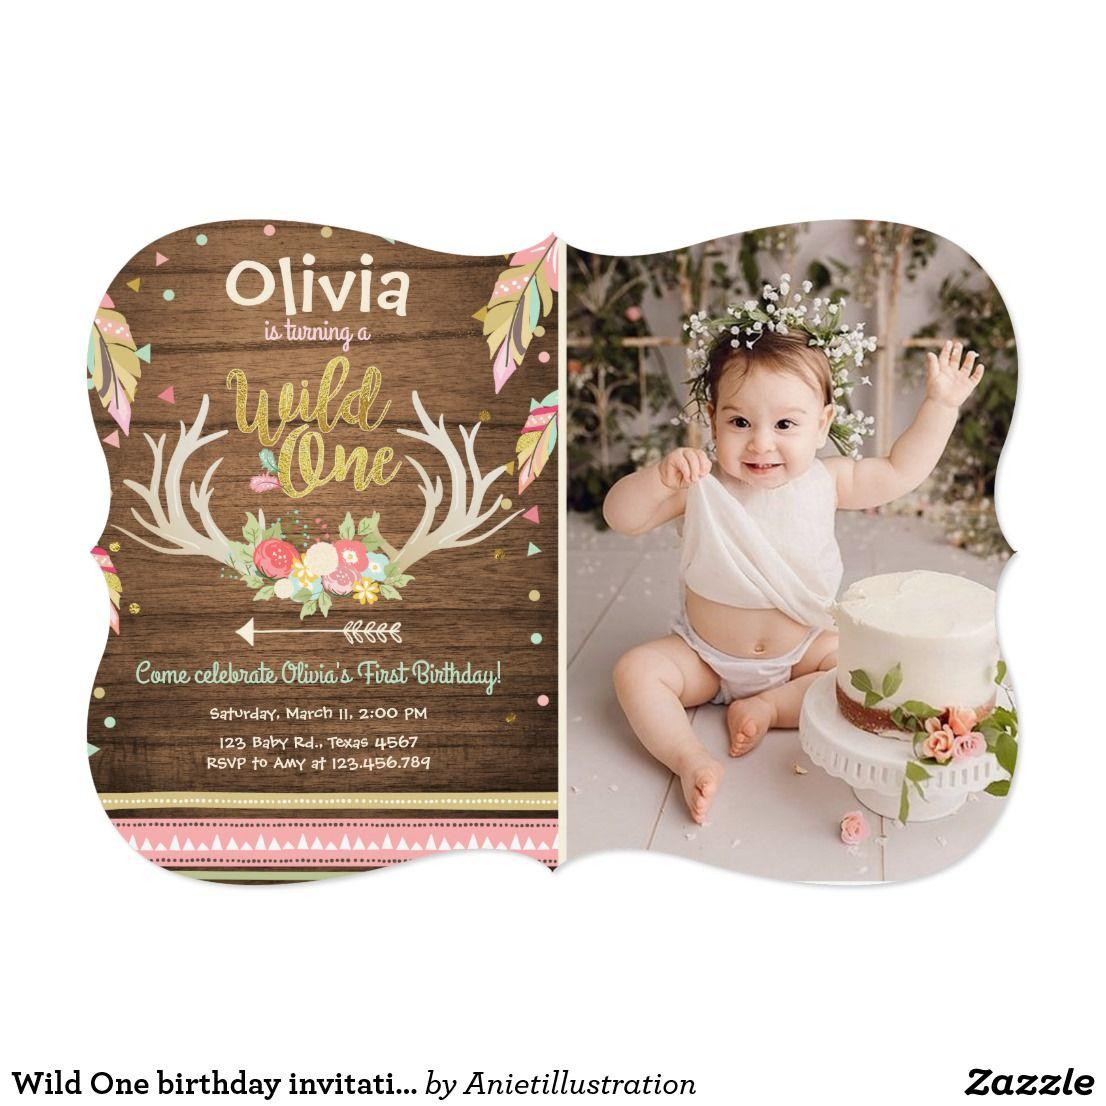 Wild One birthday invitation First birthday Girl | Idea\'s to make in ...